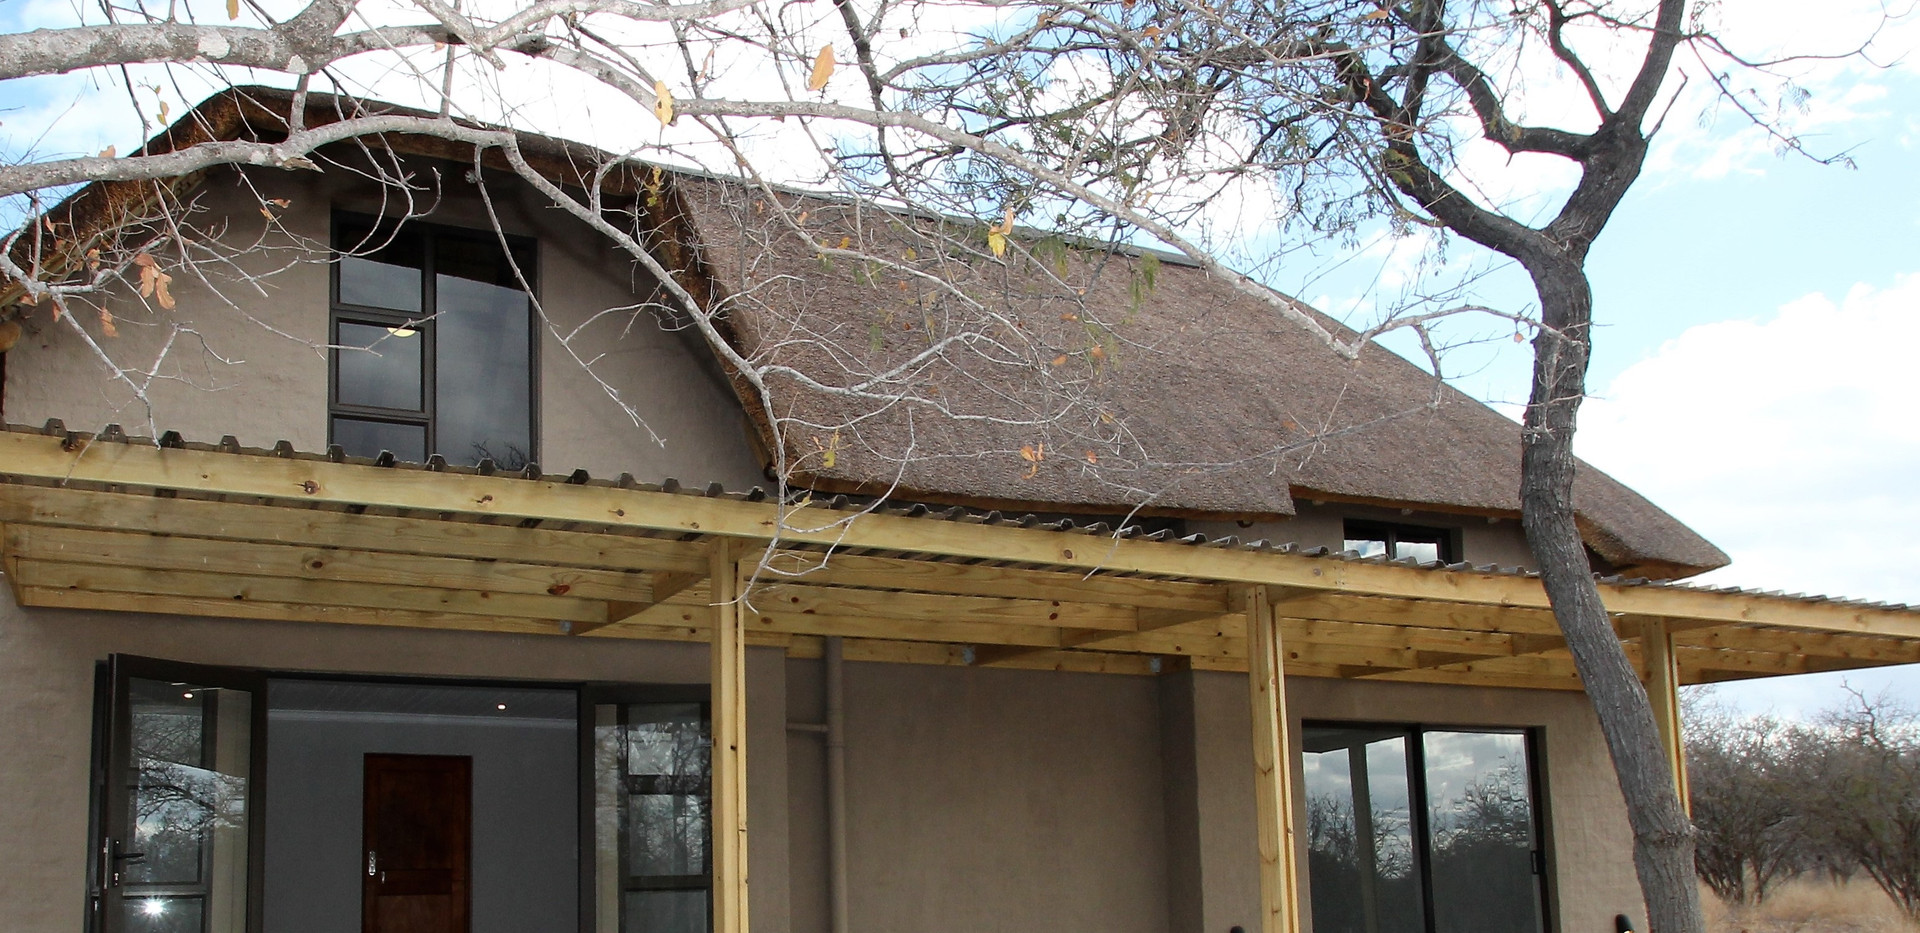 House-for-sale-in-Hoedspruit-1.jpg